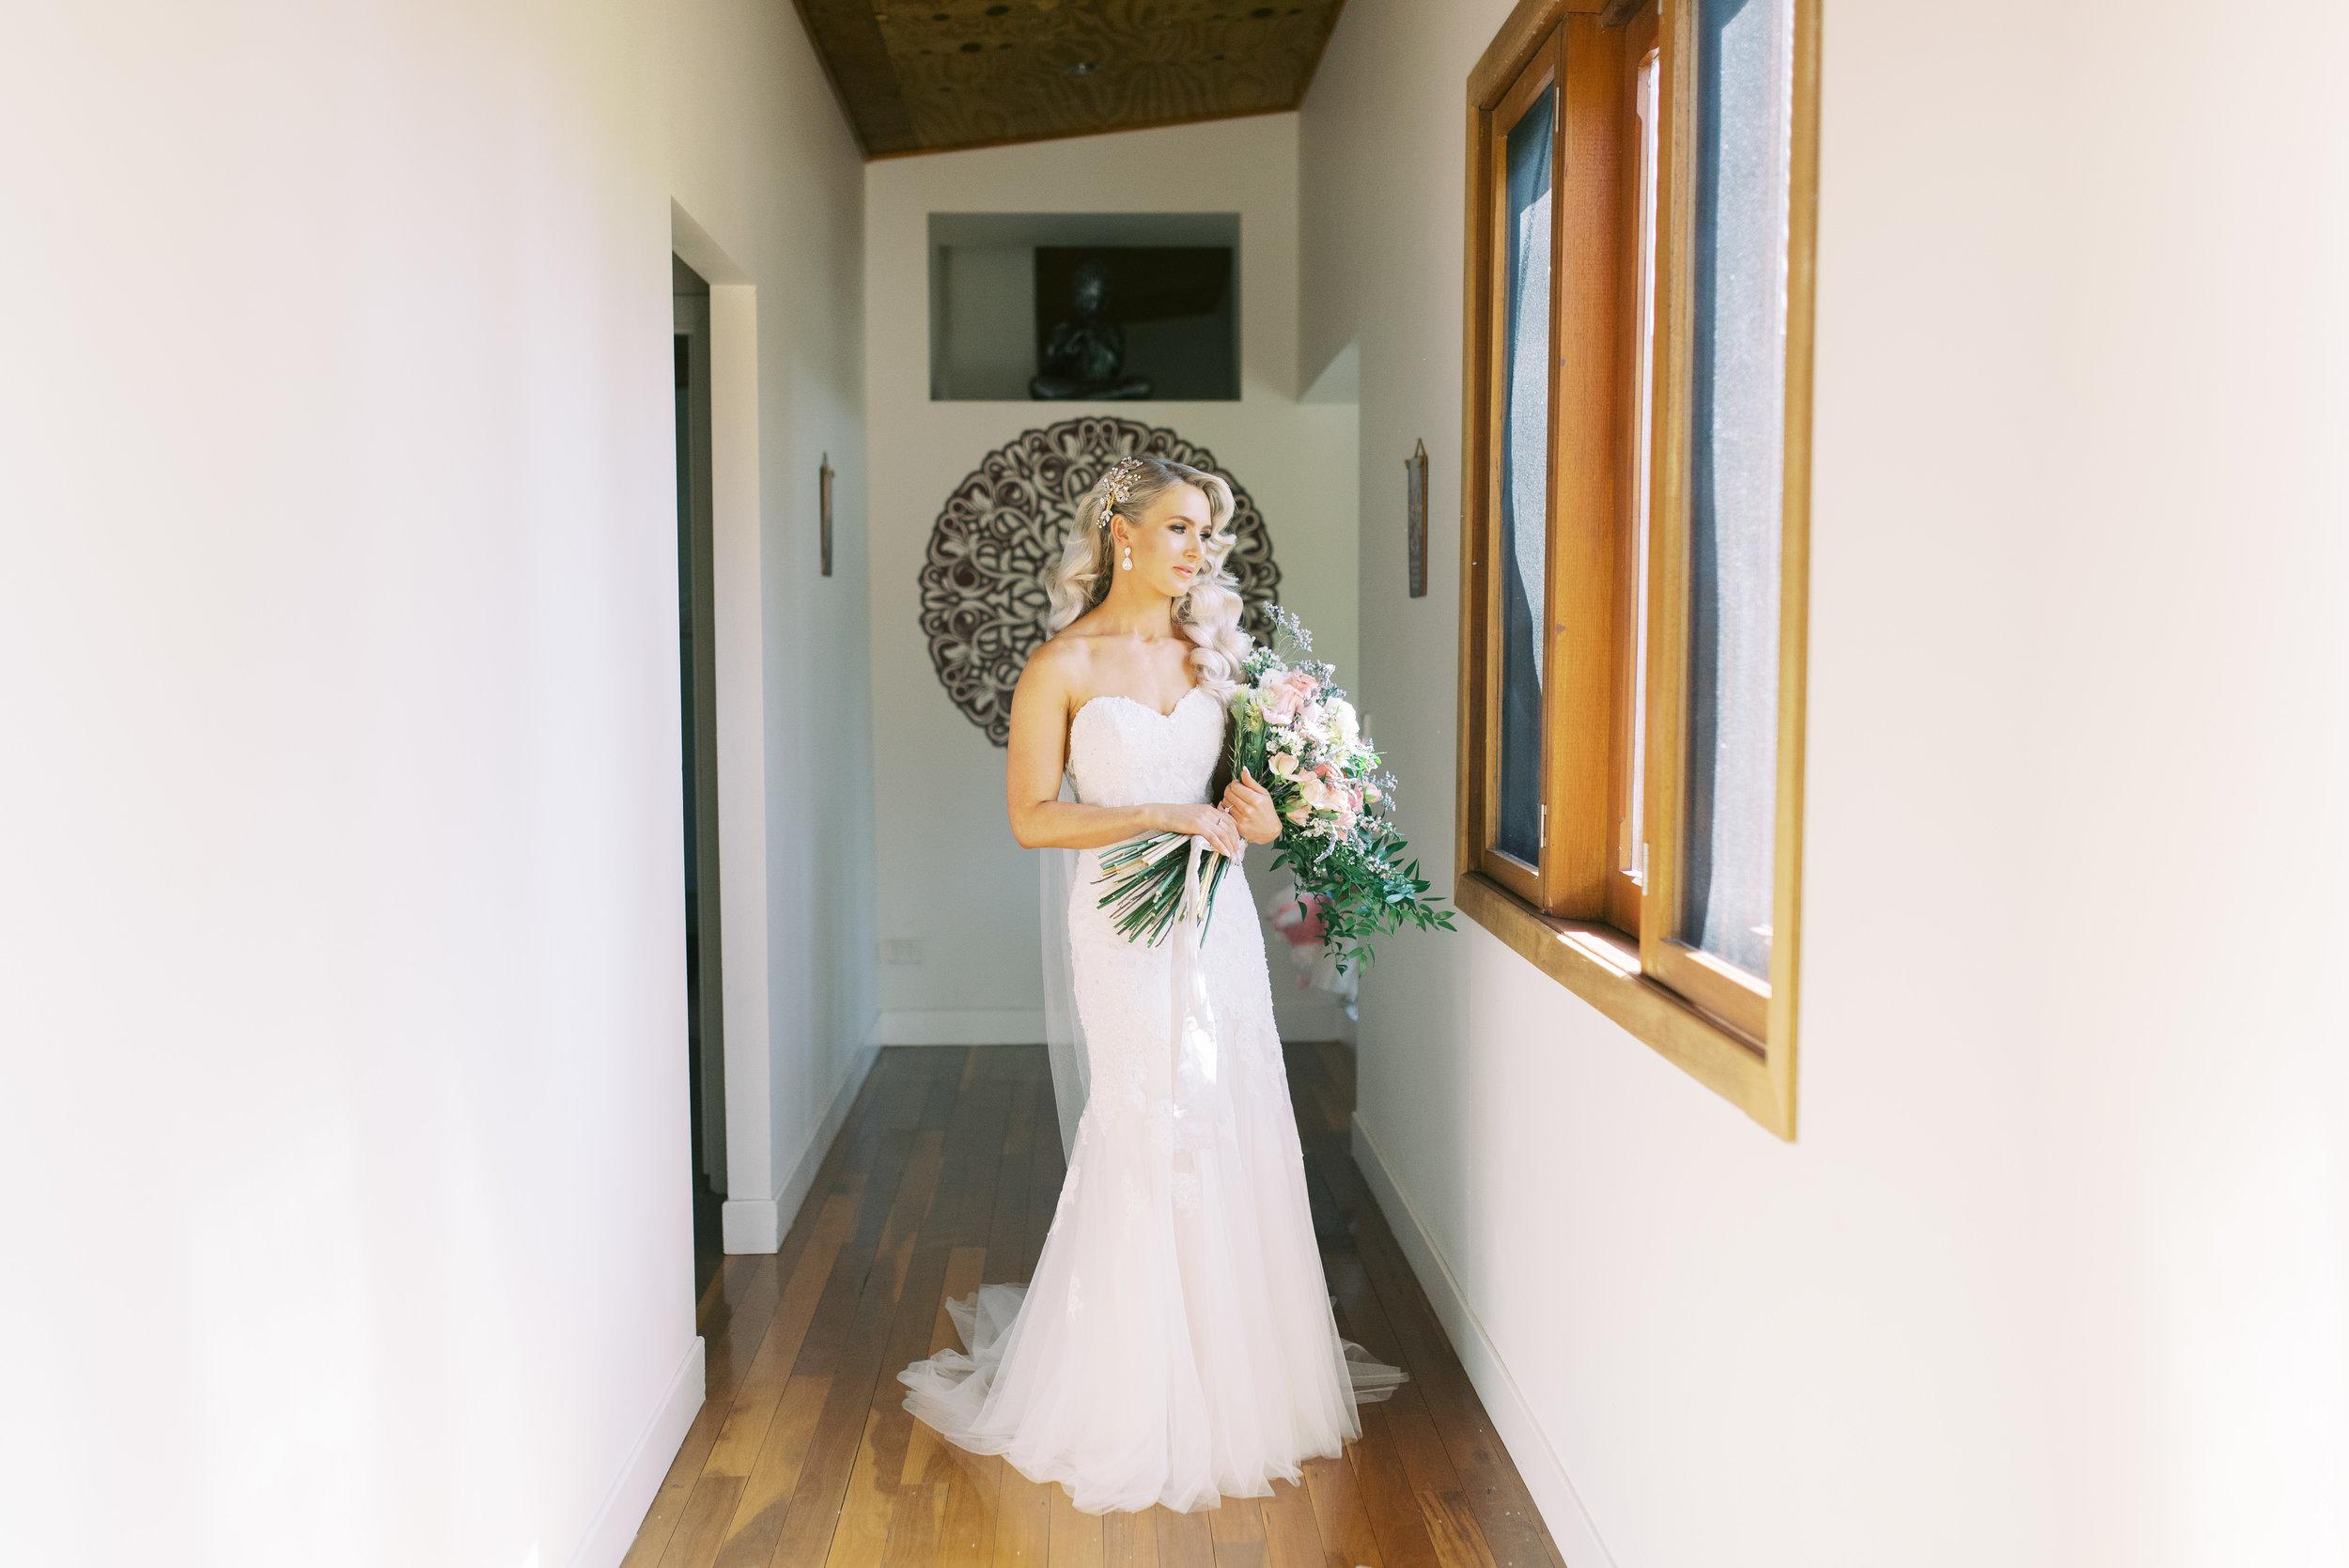 Kooroomba-Vineyard-Lavender-Farm-Wedding-Fine-Art-Lauren-Olivia-15.jpg